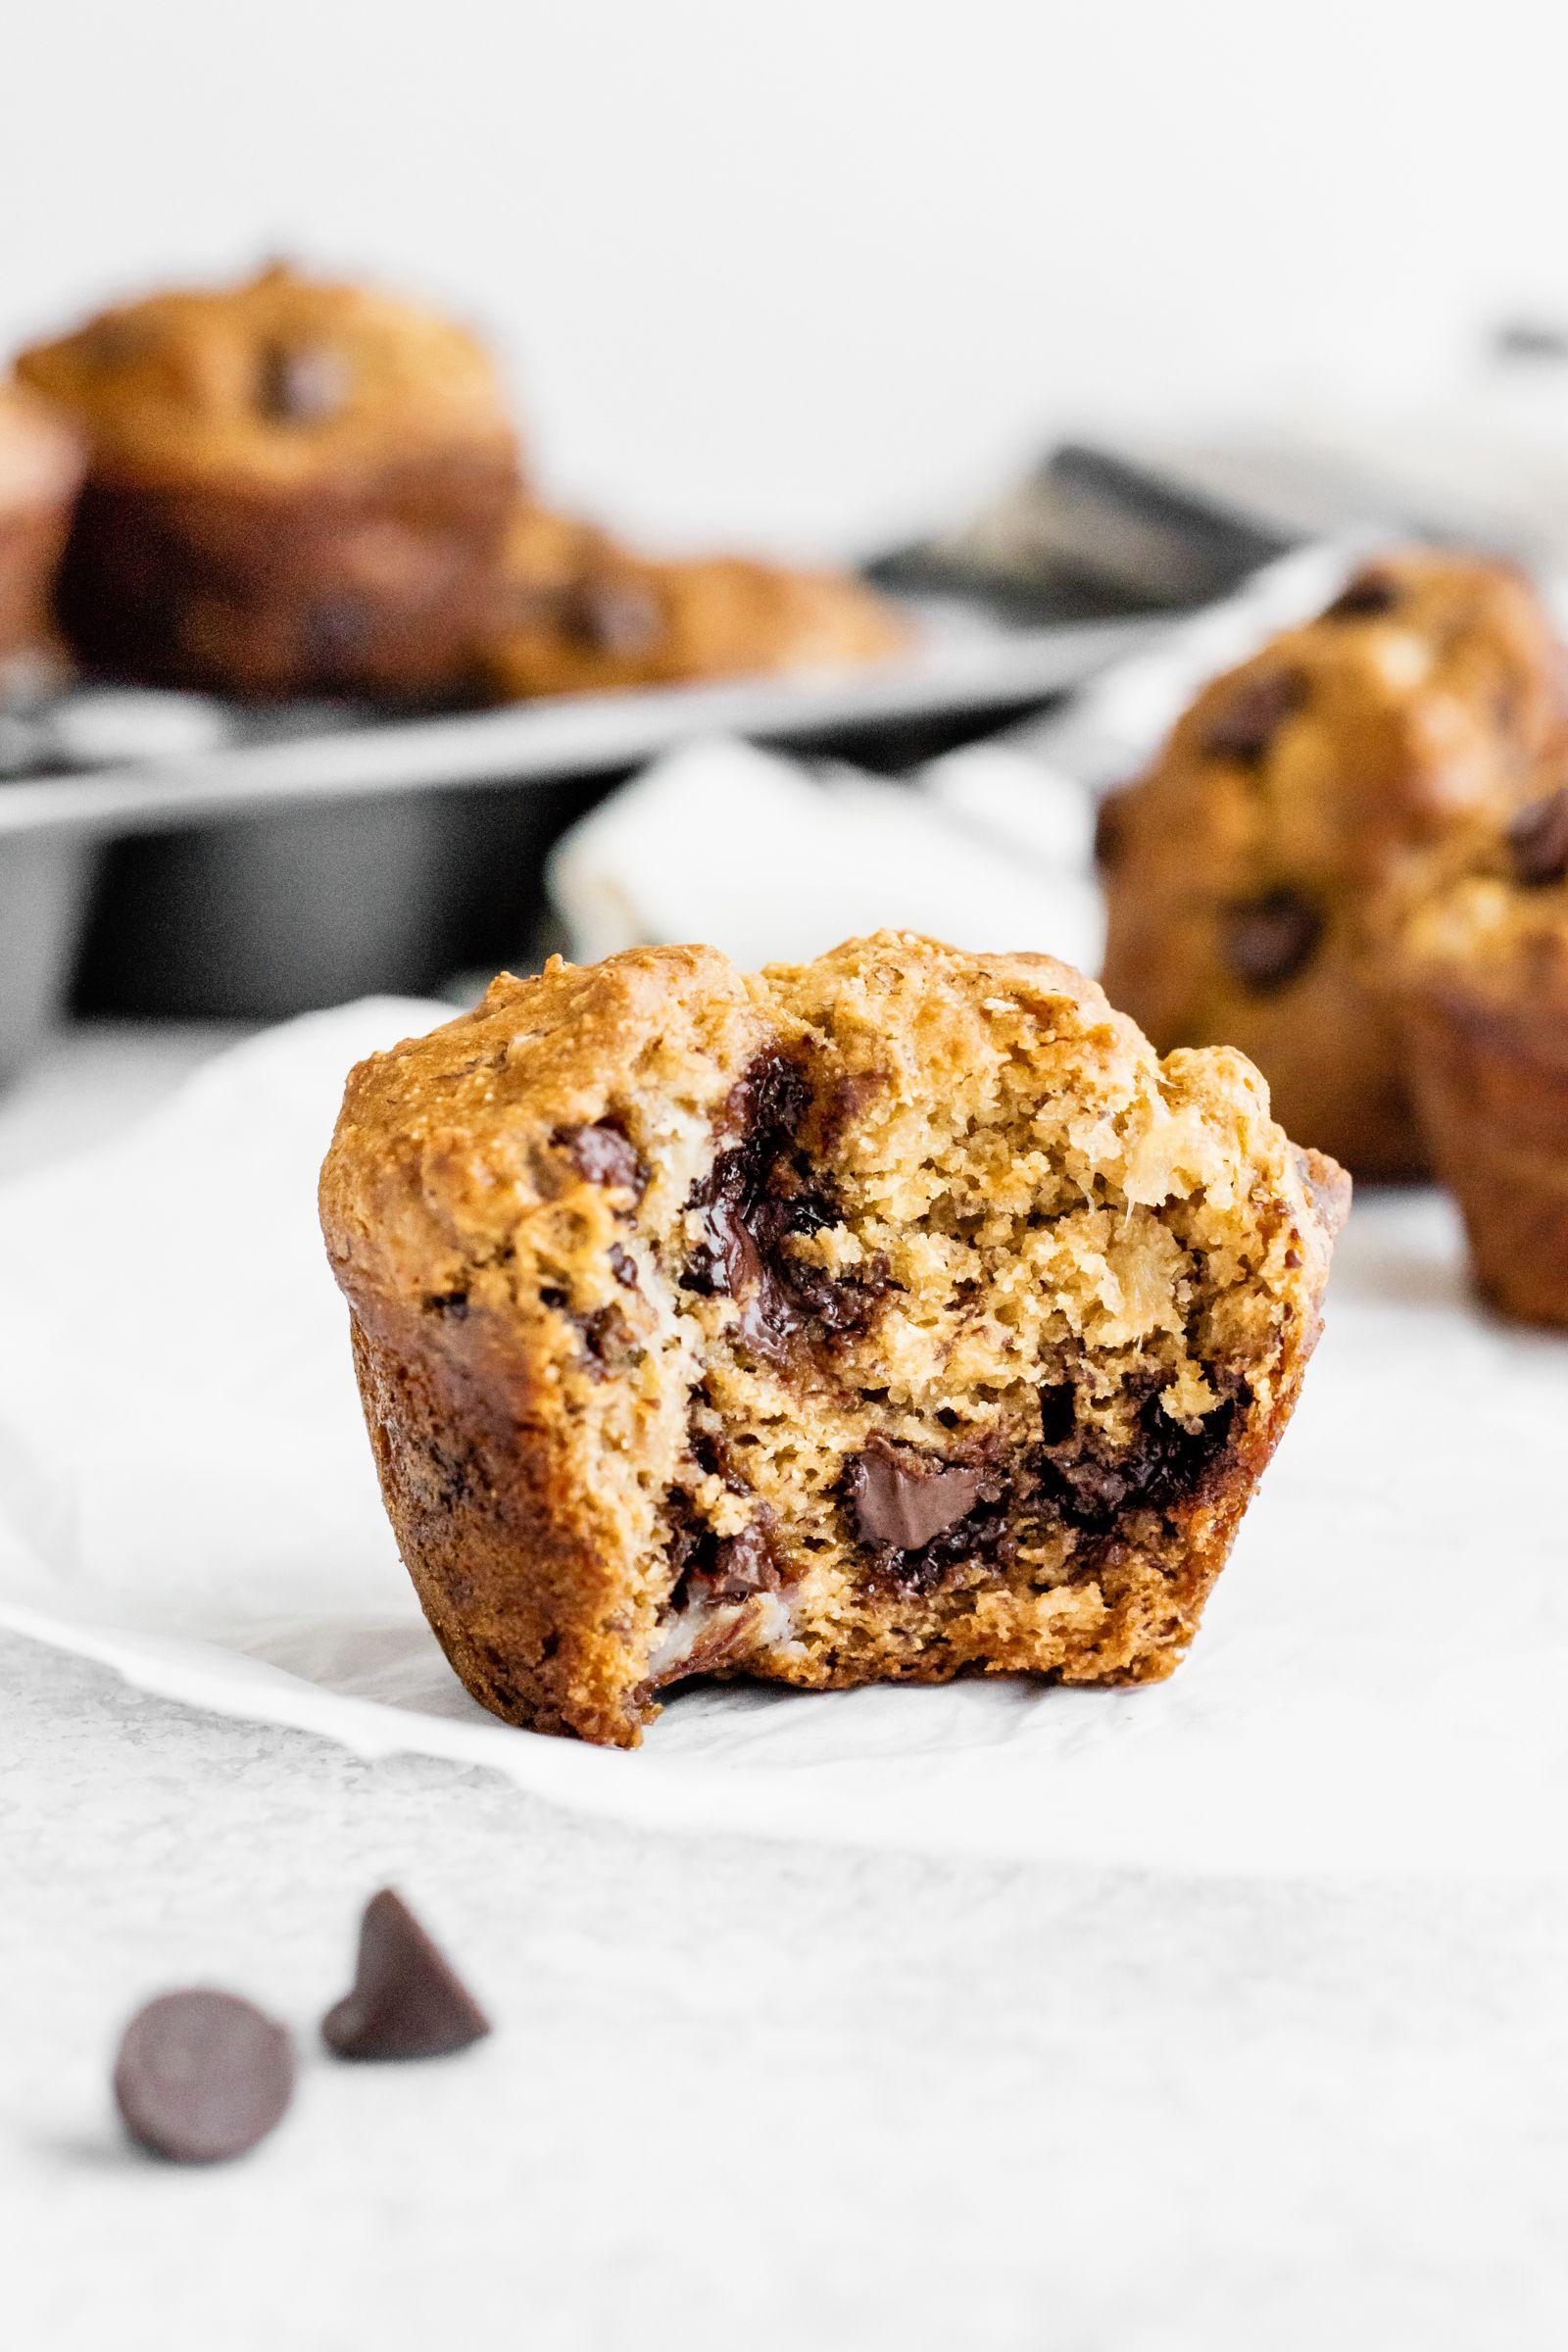 30 minute skinny banana chocolate chip muffins recipe. Black Bedroom Furniture Sets. Home Design Ideas